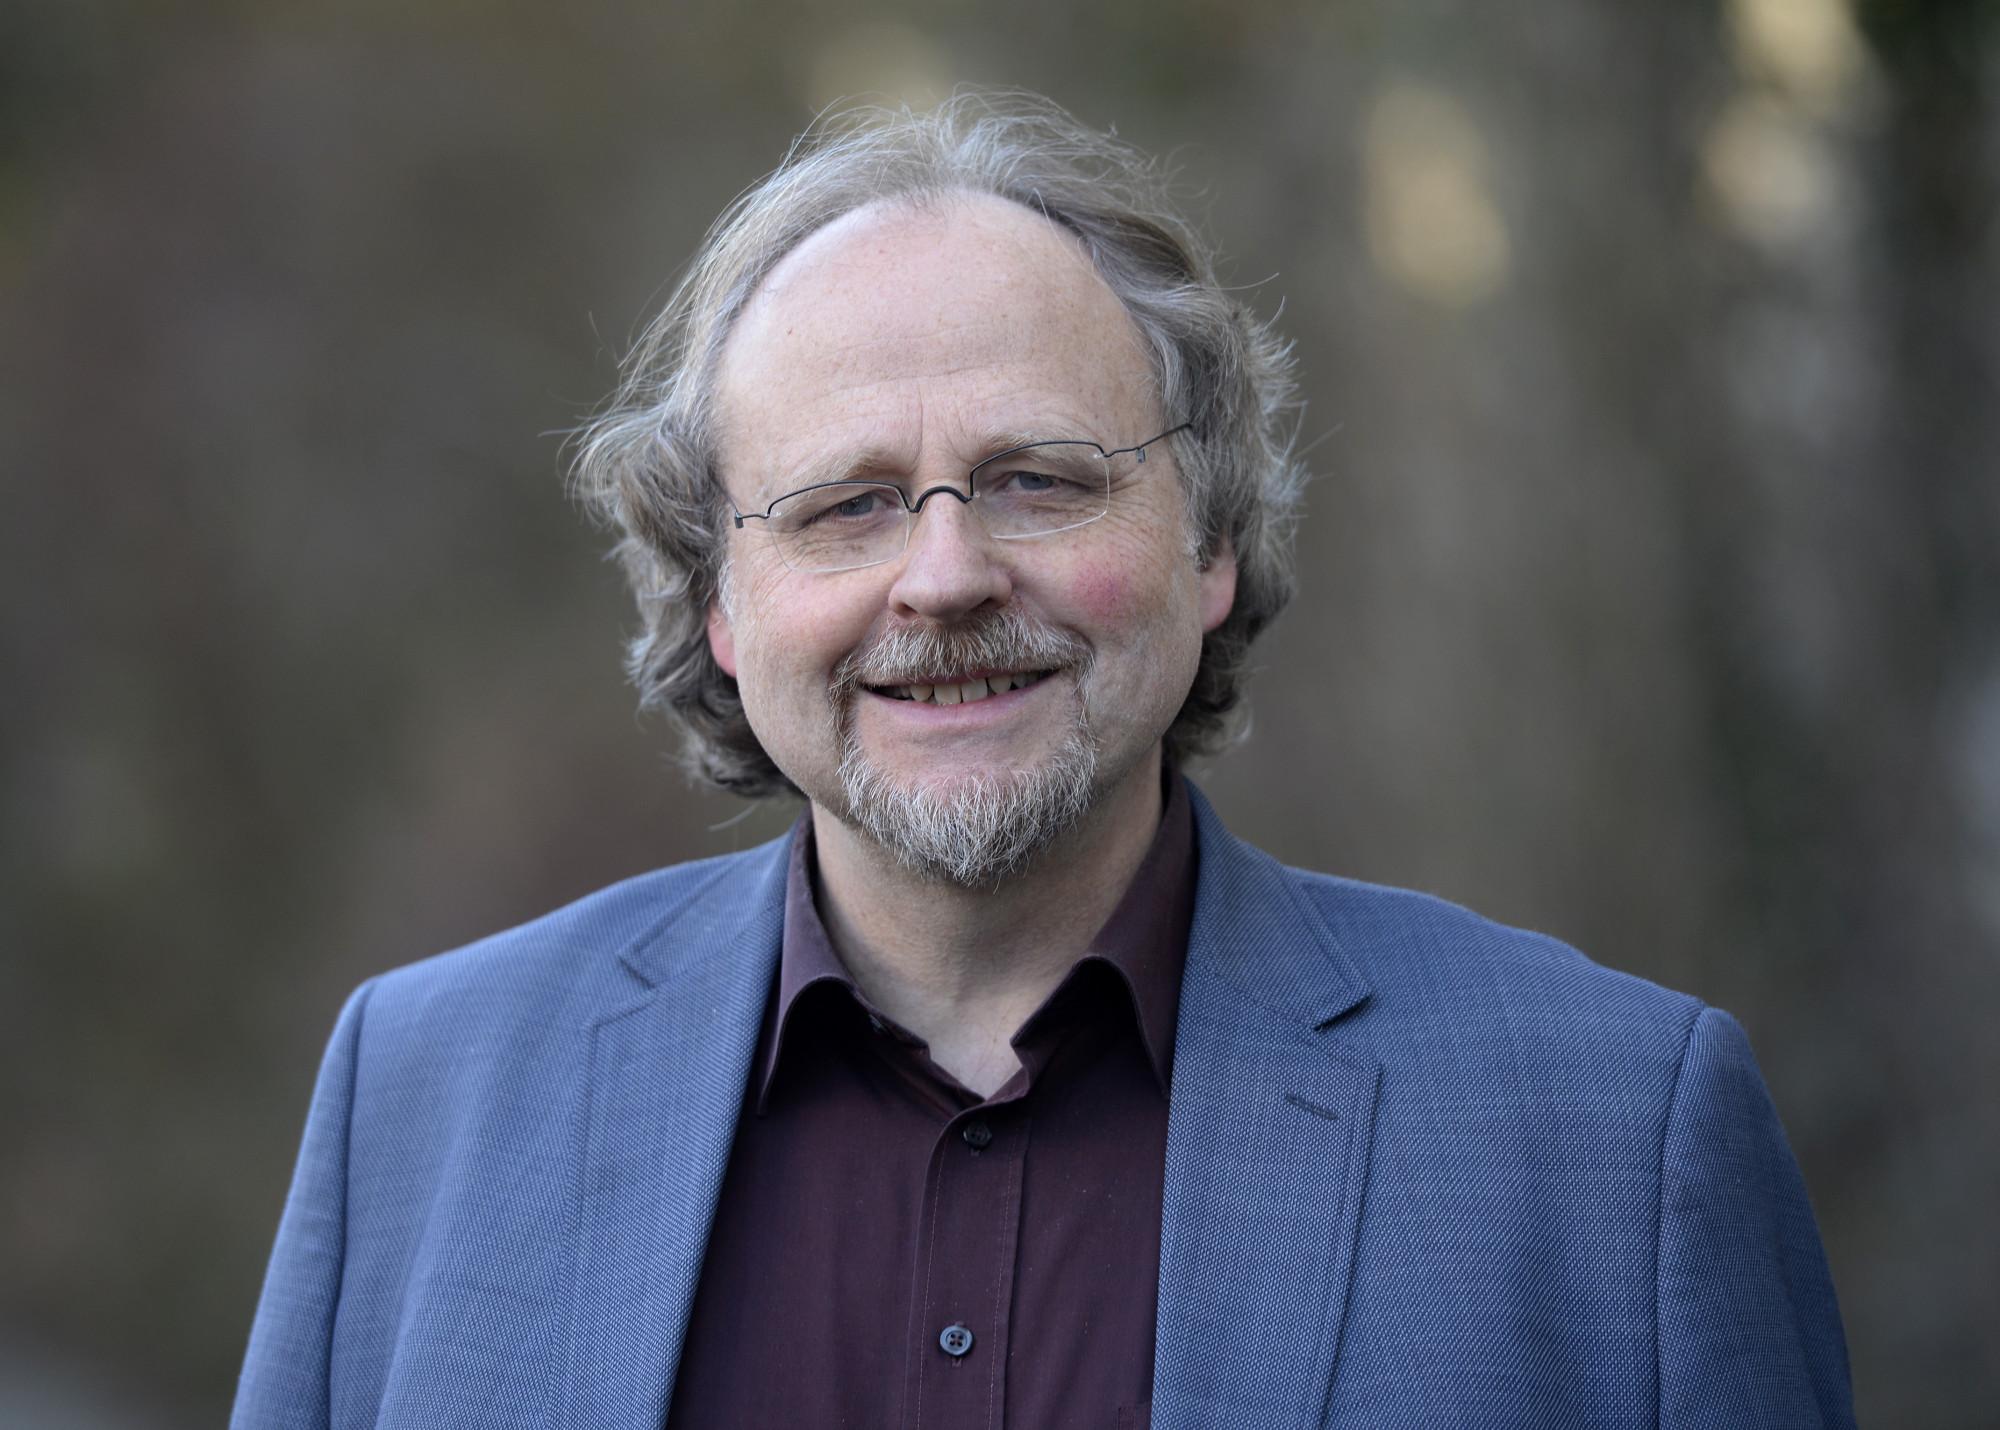 Prof. Dr. Dr. h.c. Heiner Bielefeldt